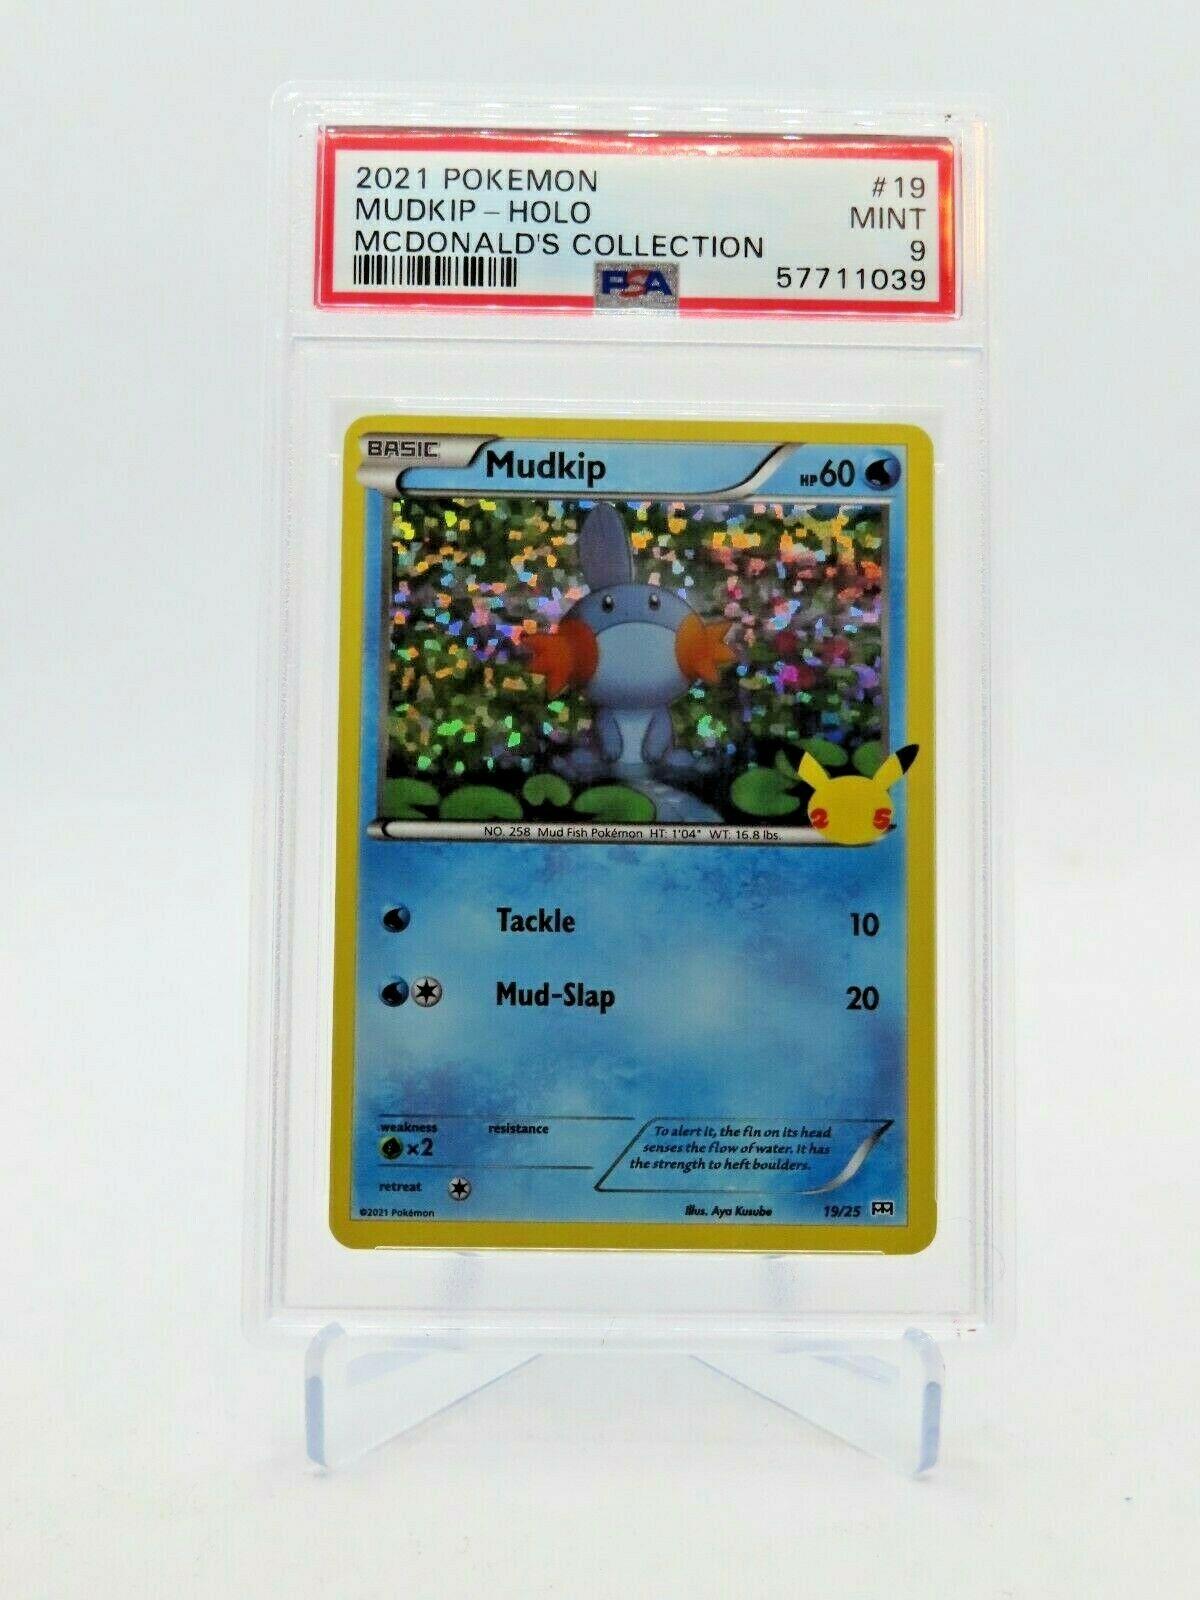 2021 McDonald's Pokemon Mudkip Holo 25th Anniversary Promo 19/25 MINT PSA 9